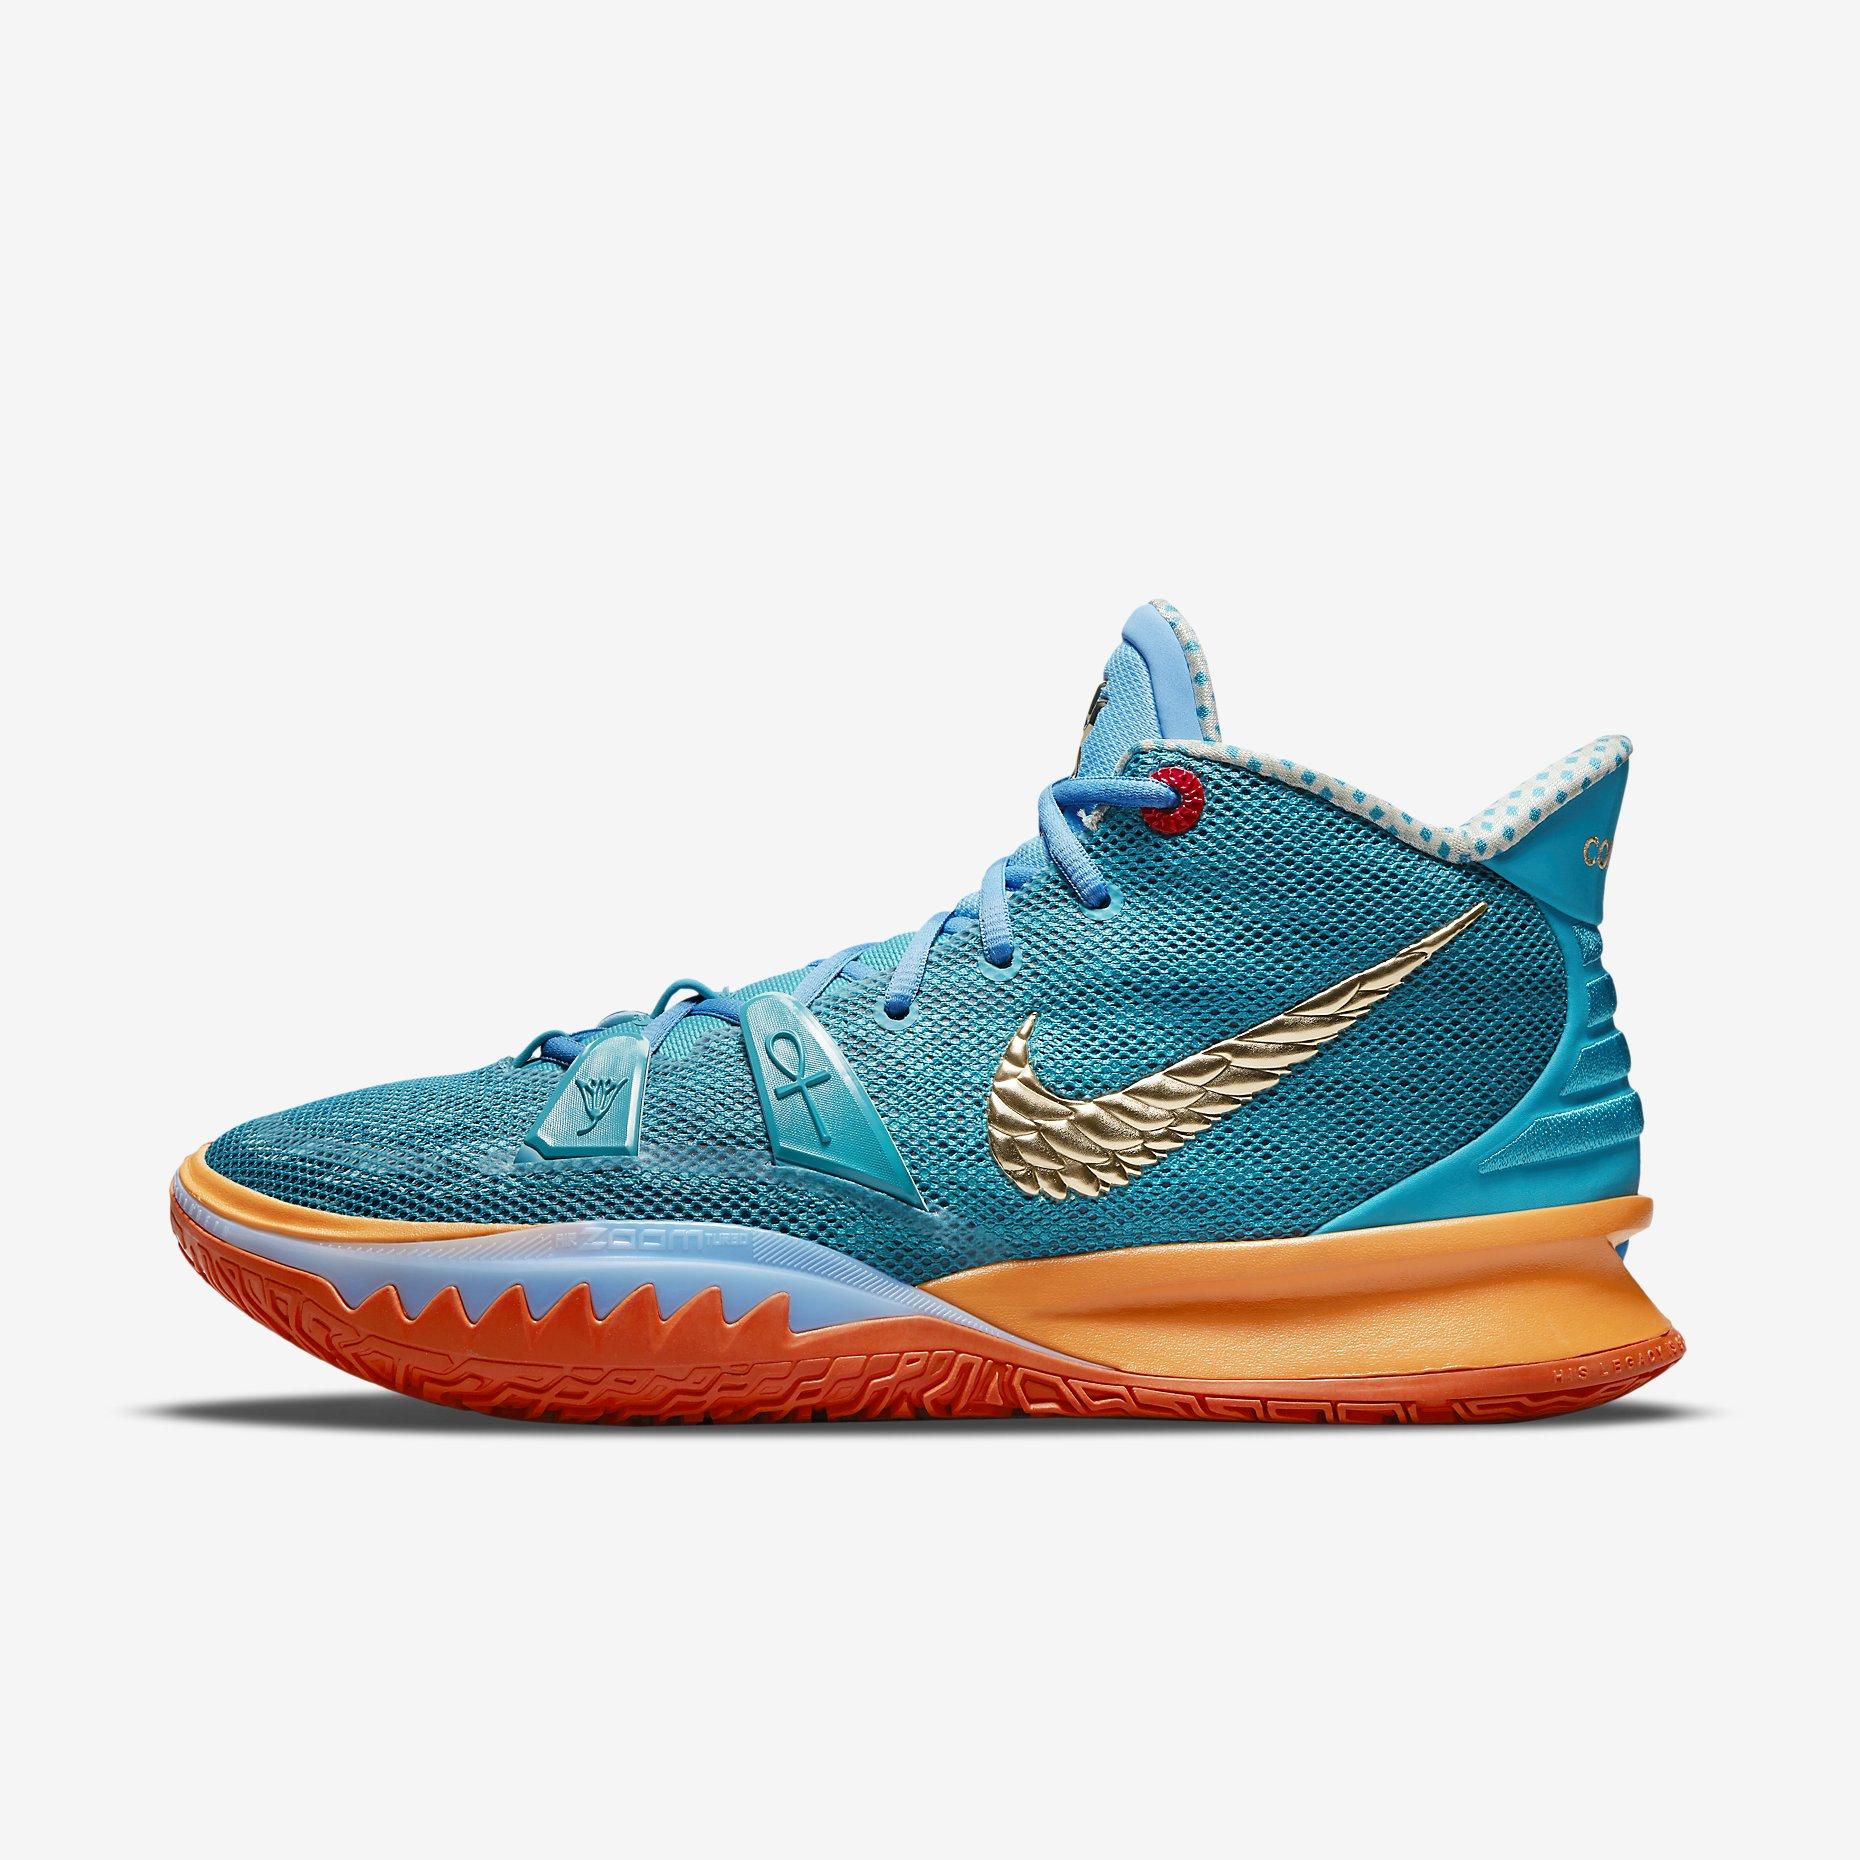 Concepts x Nike Kyrie 7 'Horus'}